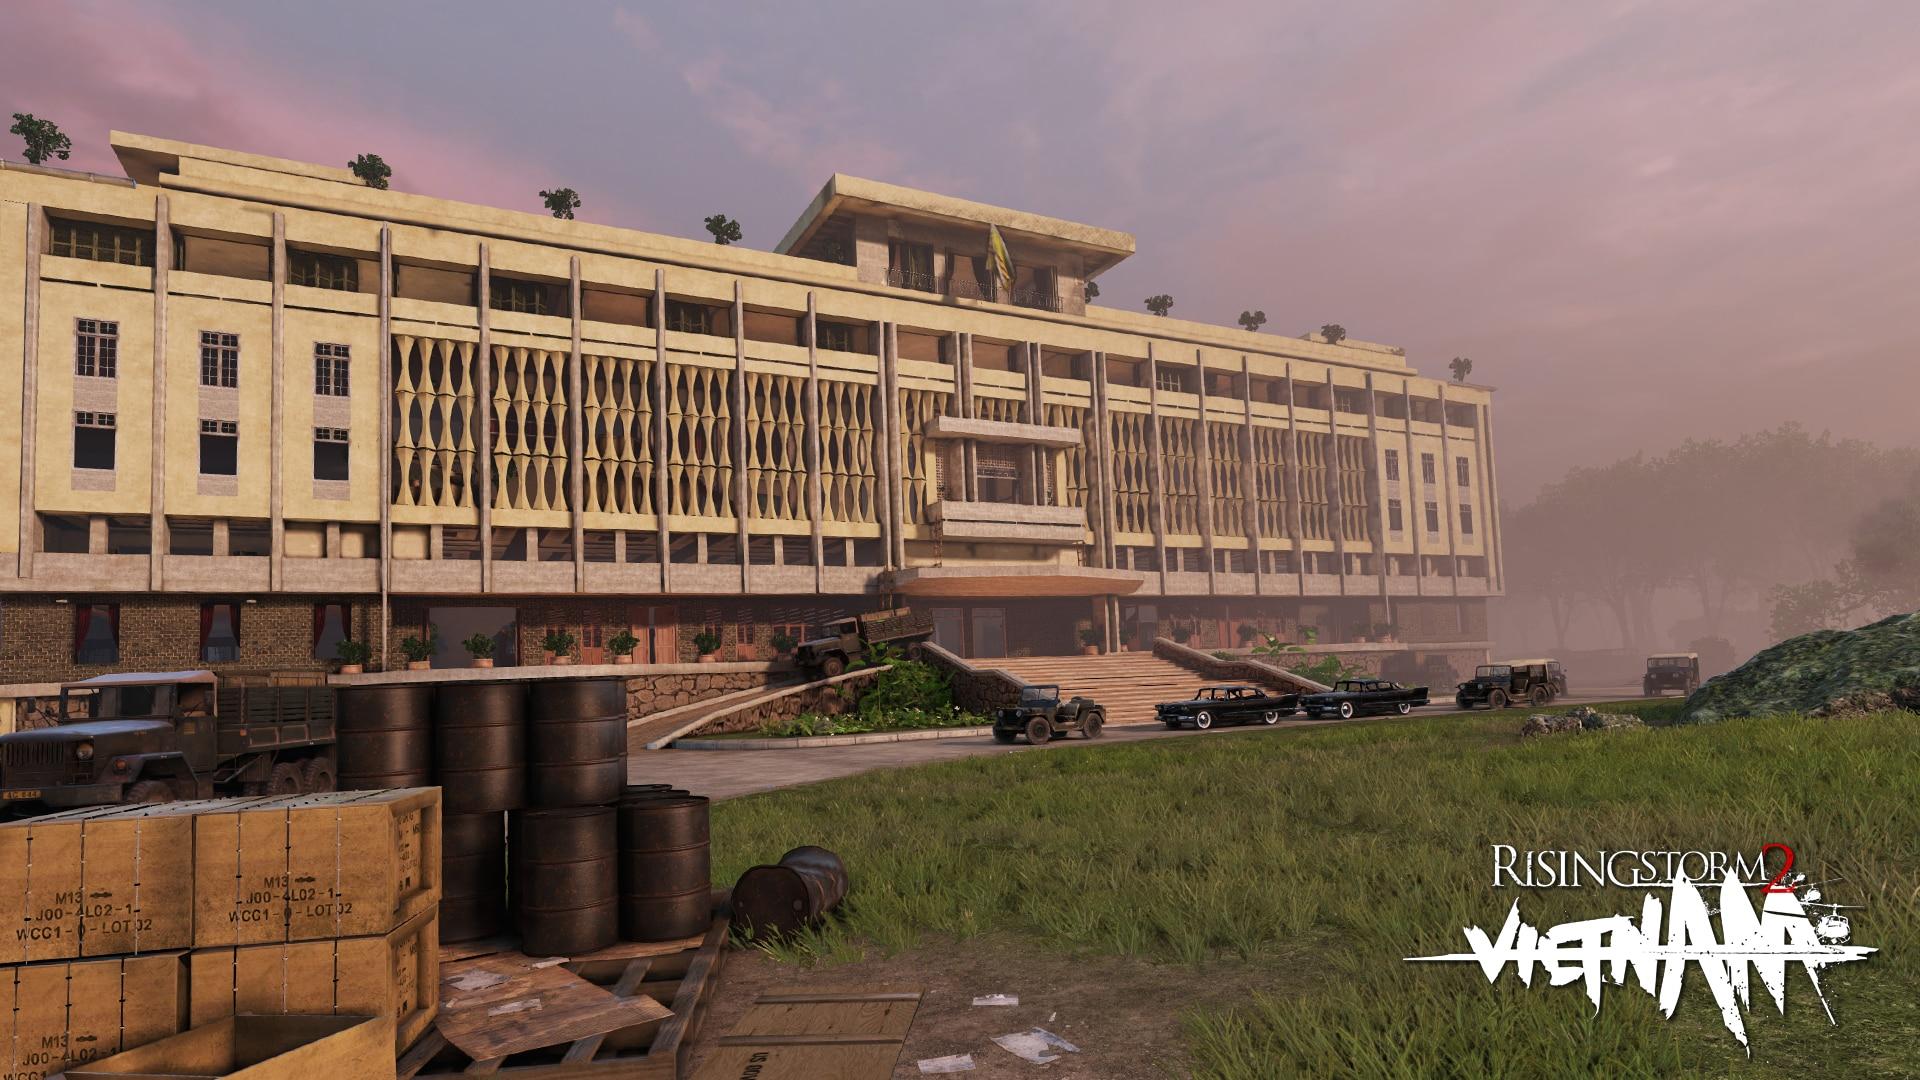 Rising Storm 2: Vietnam - Digital Deluxe Steam Key GLOBAL - 2